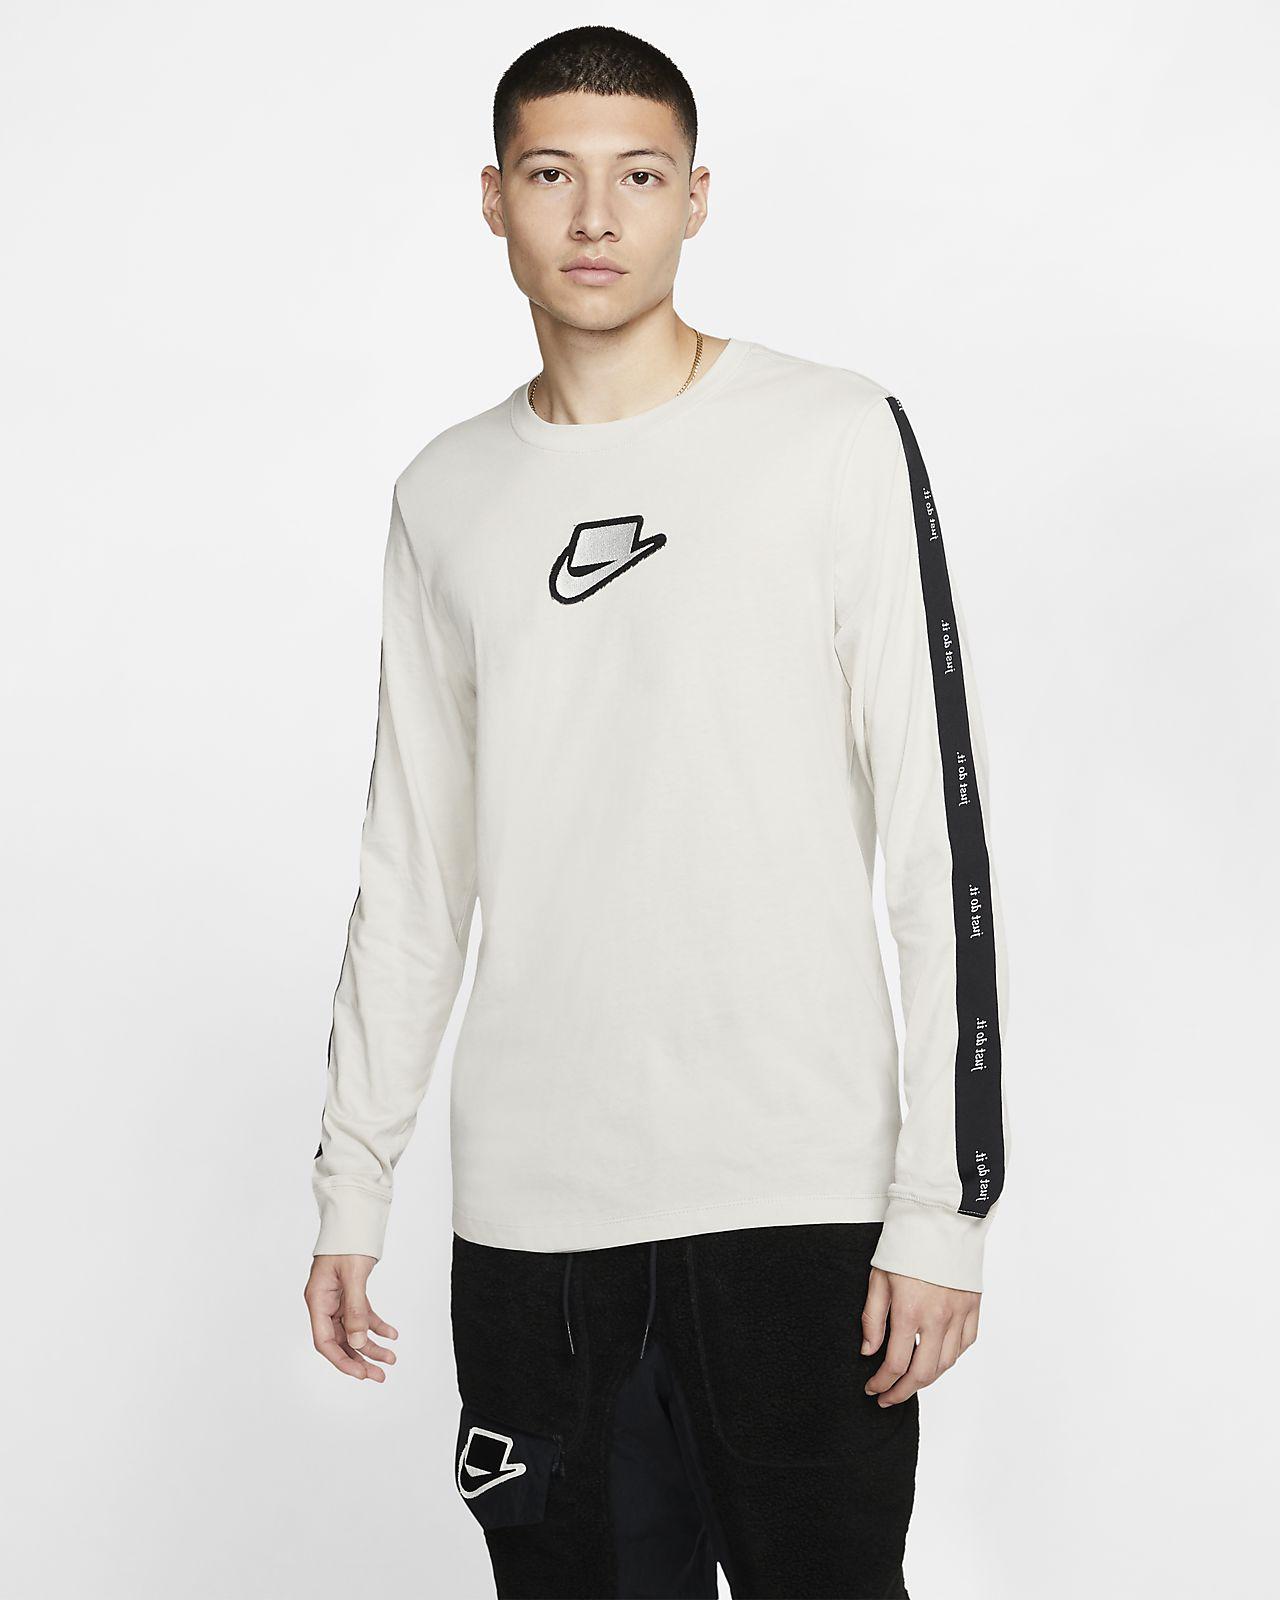 NSW T Sportswear Herren Nike Langarm für Shirt O80PXnwk